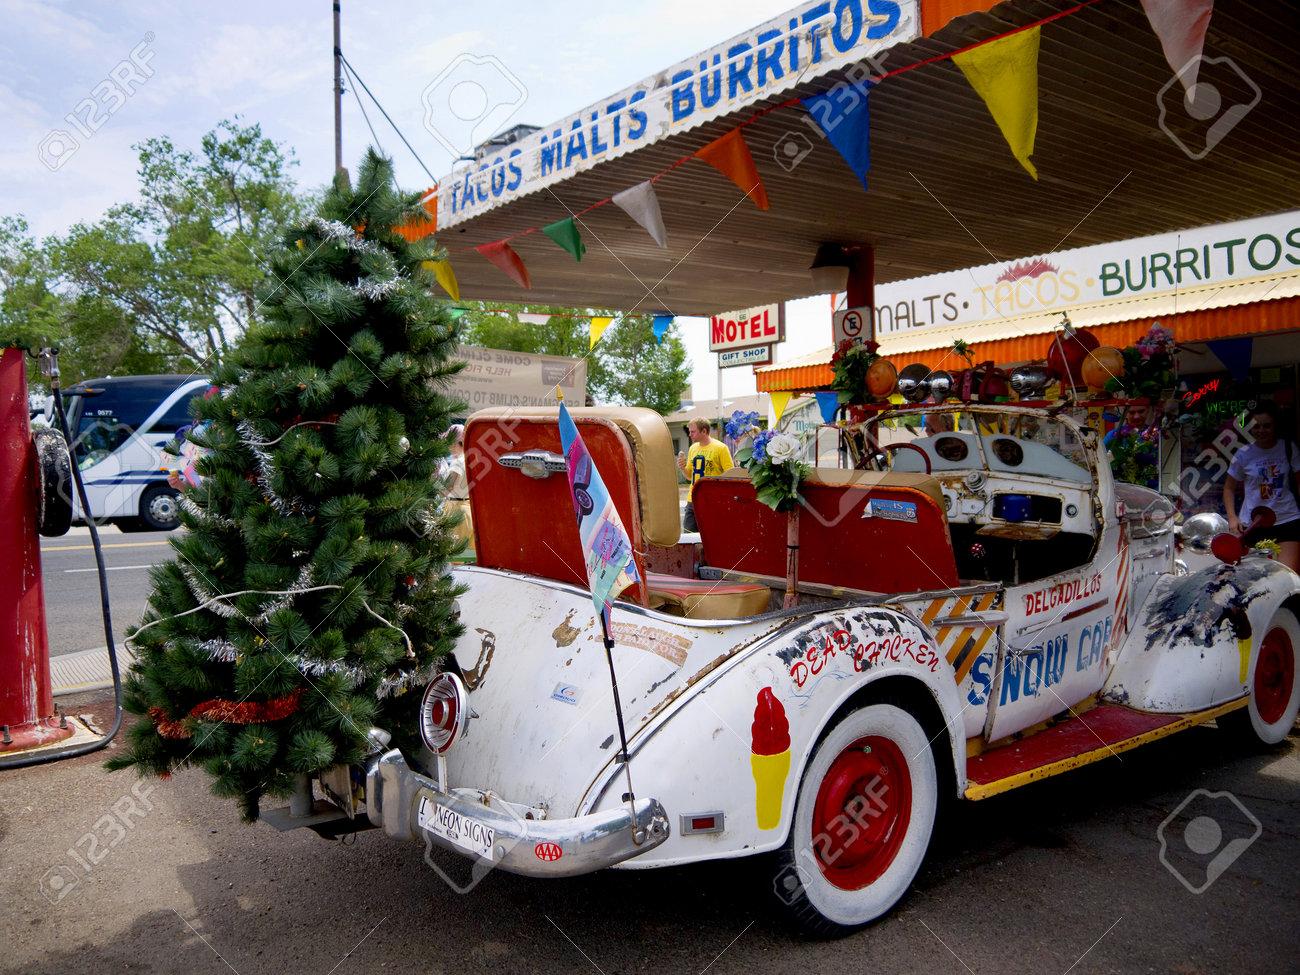 Seligman town on Route 66 in Yavapai County, Arizona, United States Stock Photo - 14699864